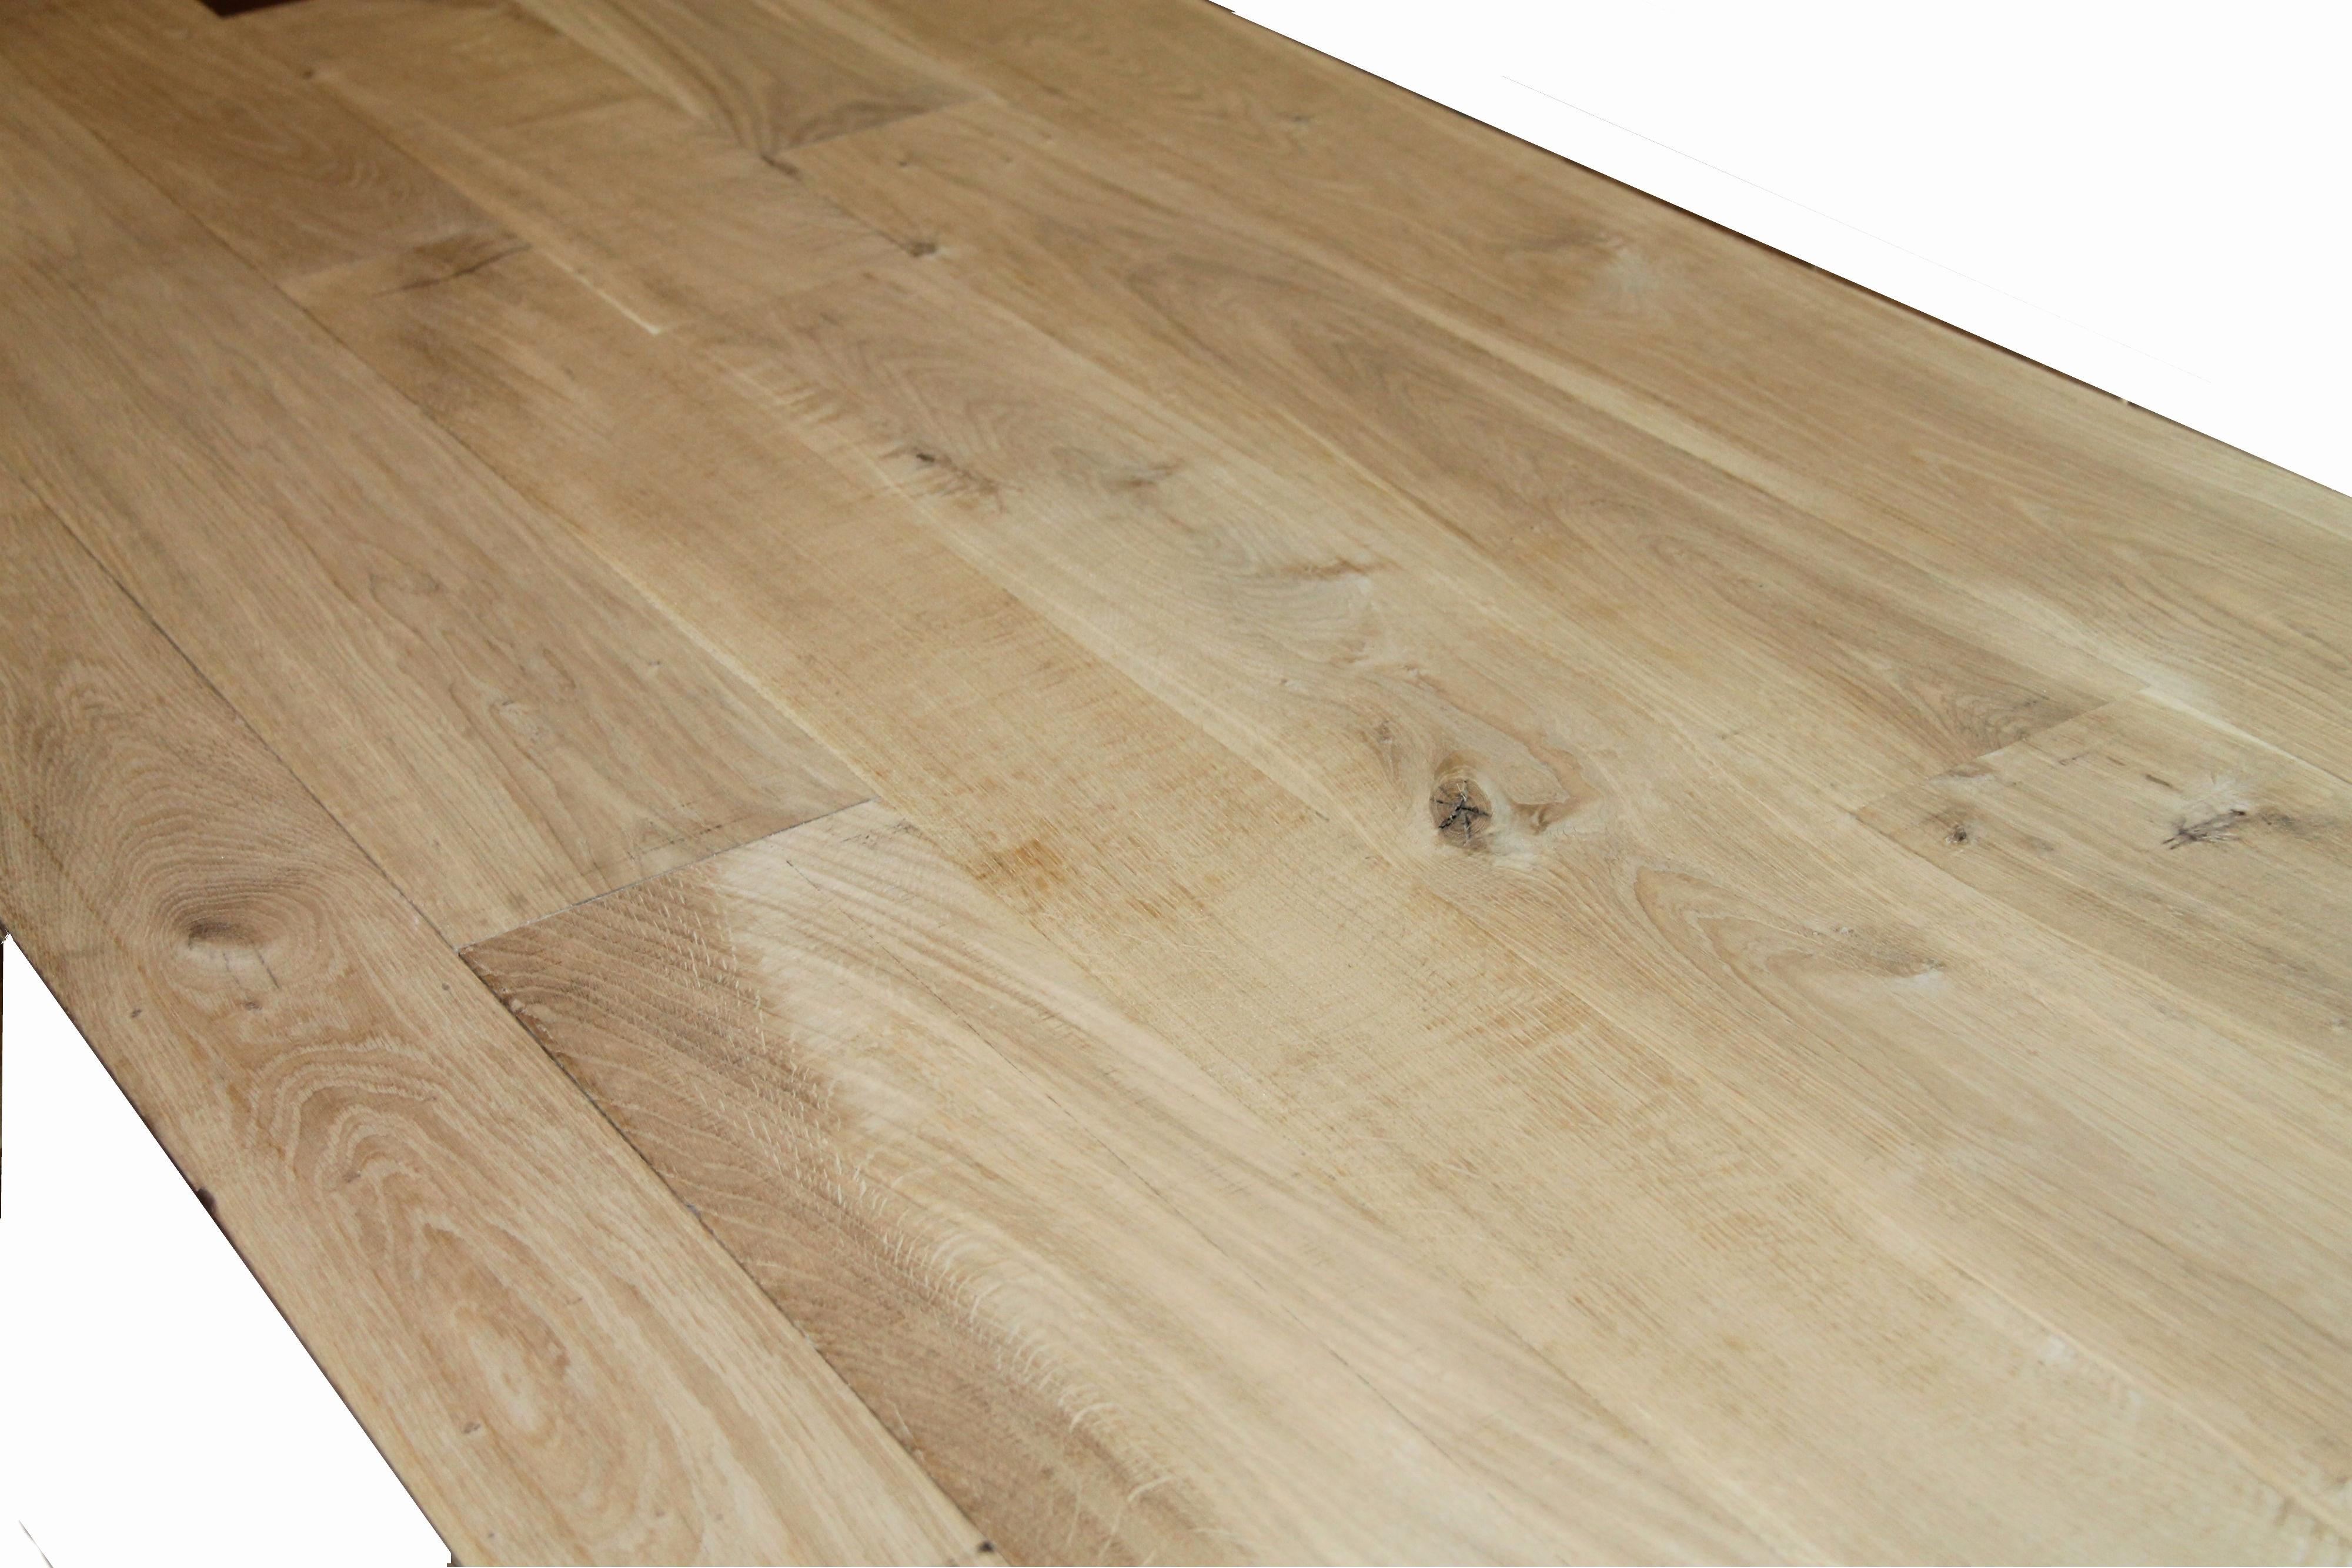 how to refinish hardwood floors cost of 18 elegant hardwood flooring cost stock dizpos com throughout hardwood flooring cost awesome 50 fresh engineered hardwood flooring cost 50 s pics of 18 elegant